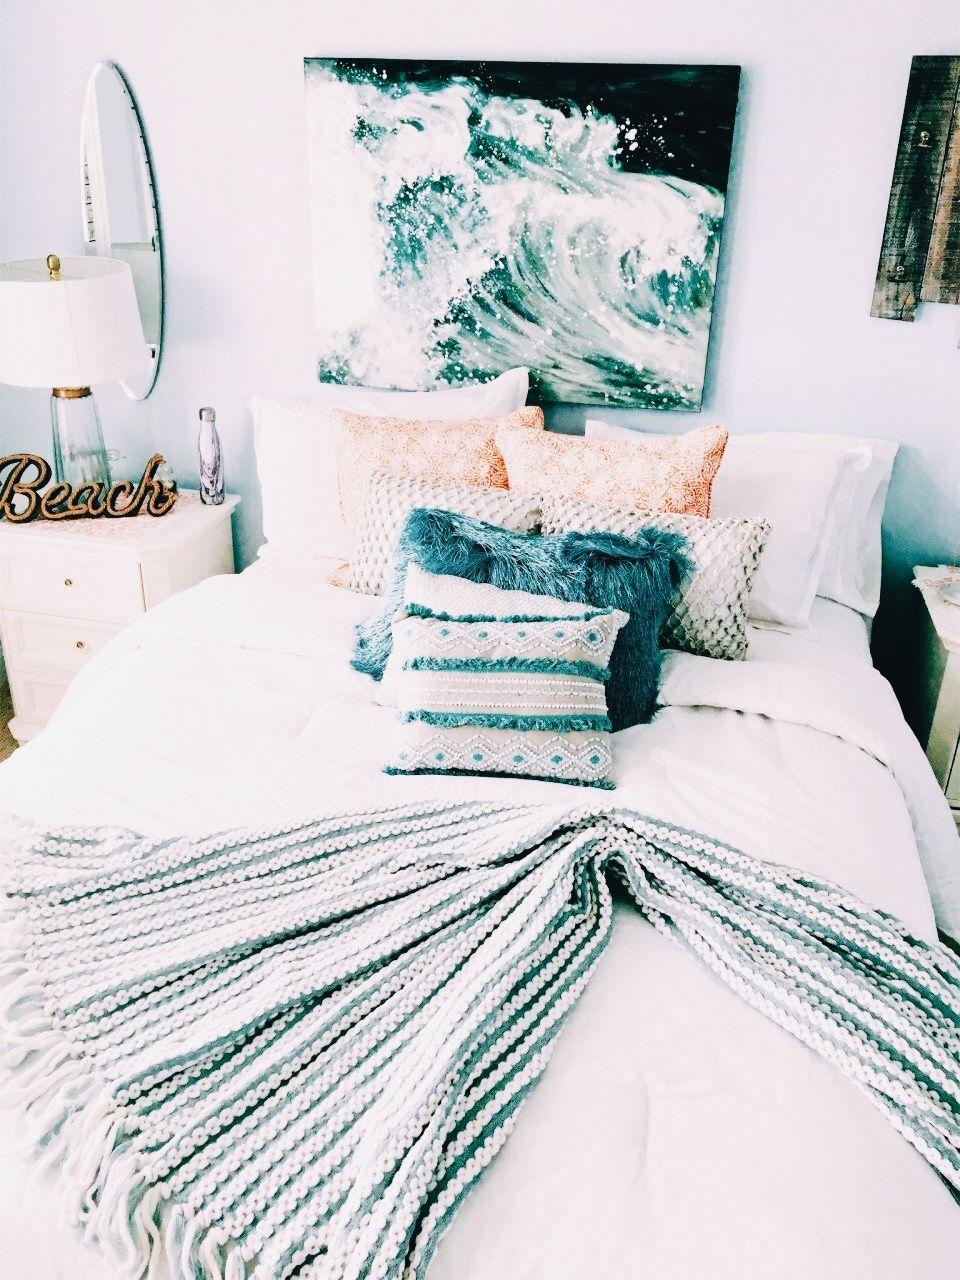 Pinterest Caitiharper Insta Caitiharper Home Bedroom Dorm